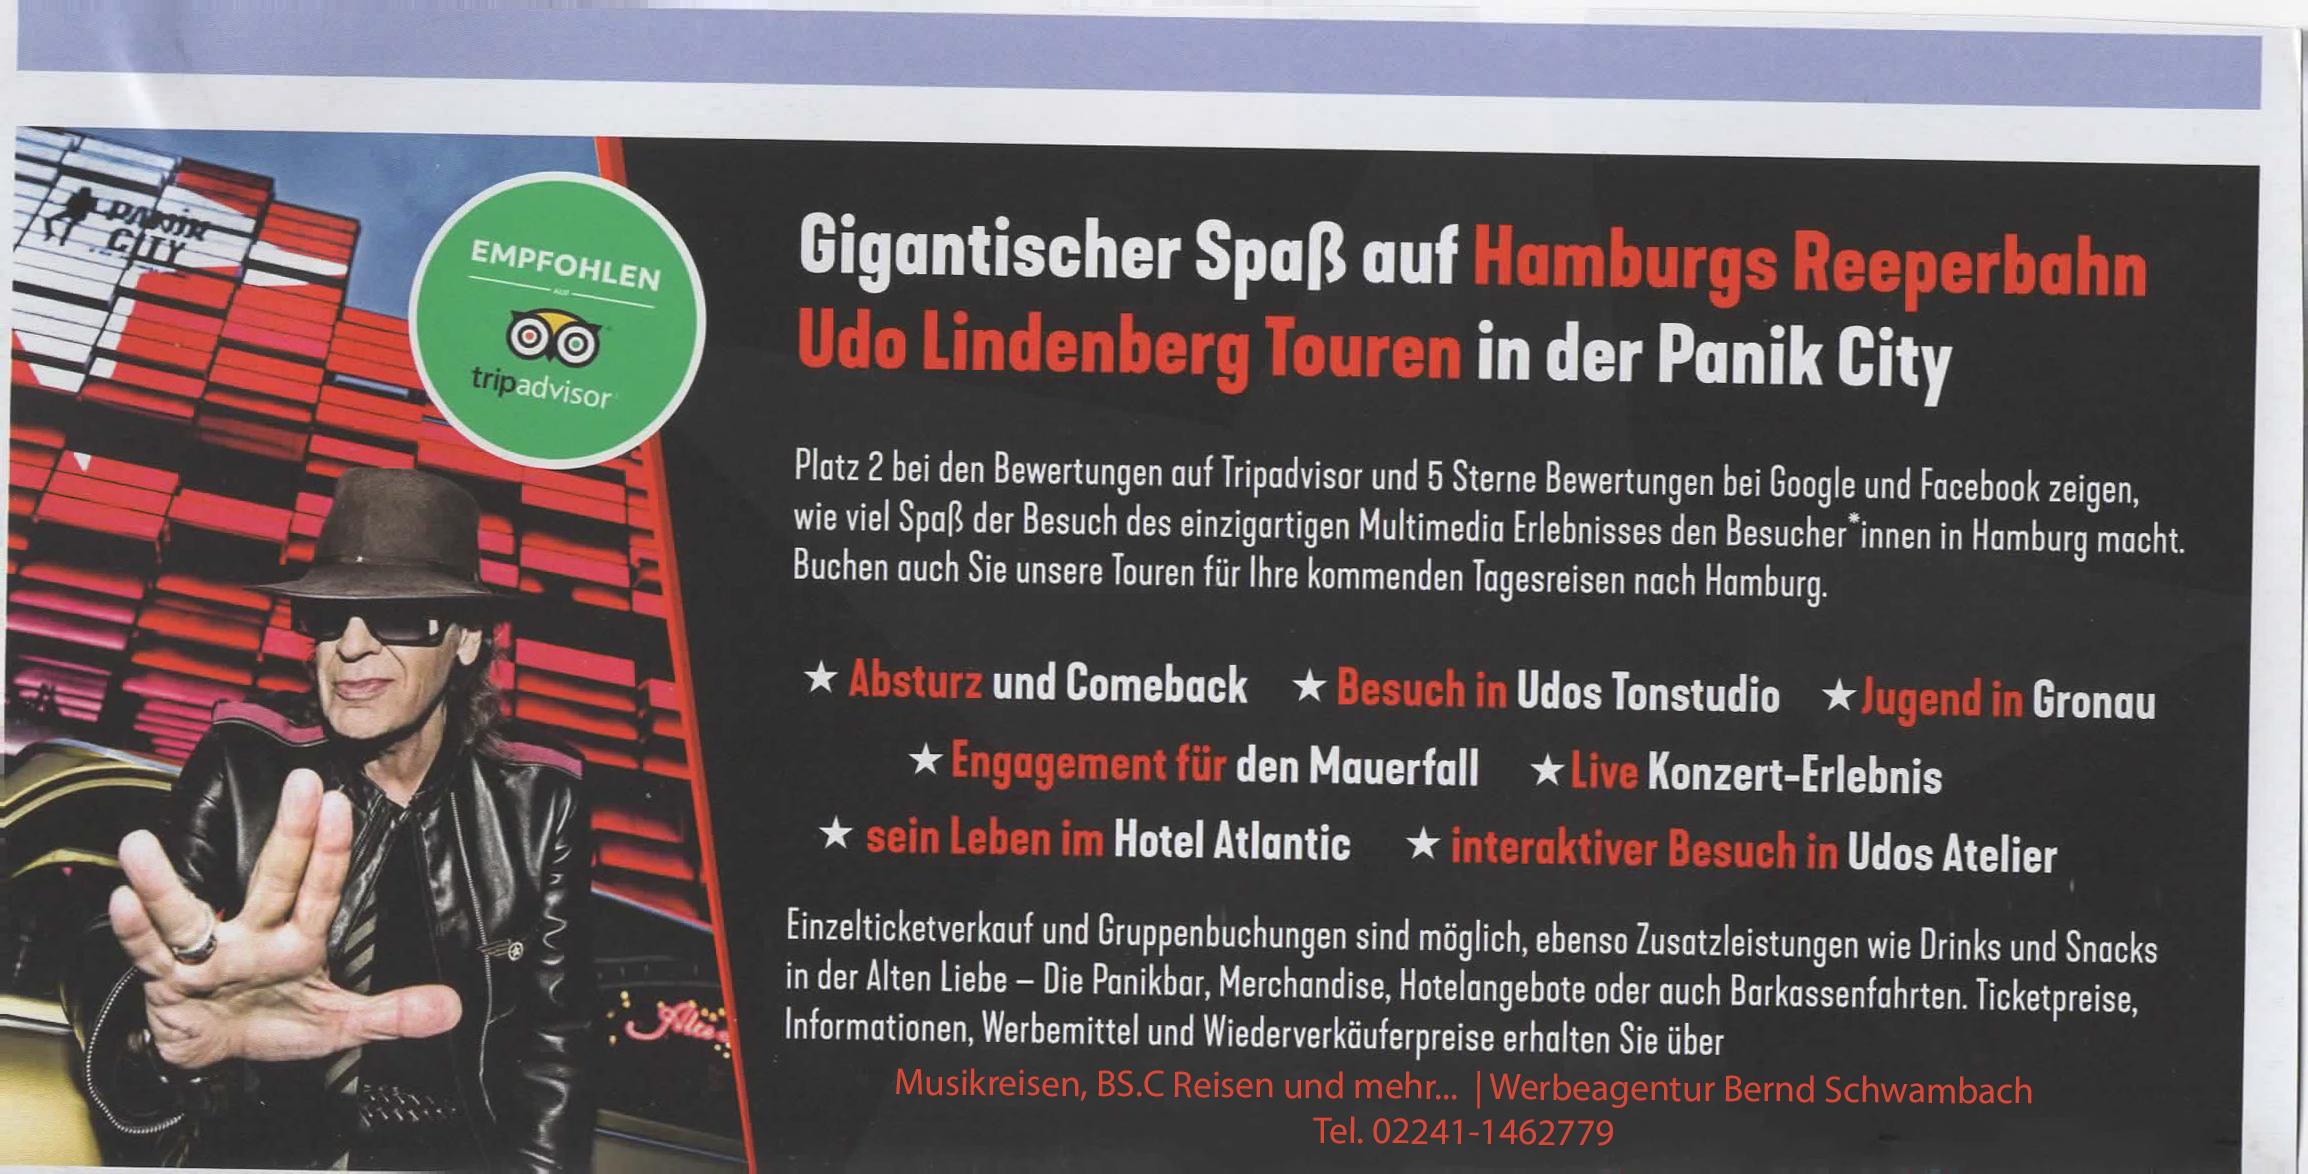 Spaß mit Udo Lindenberg